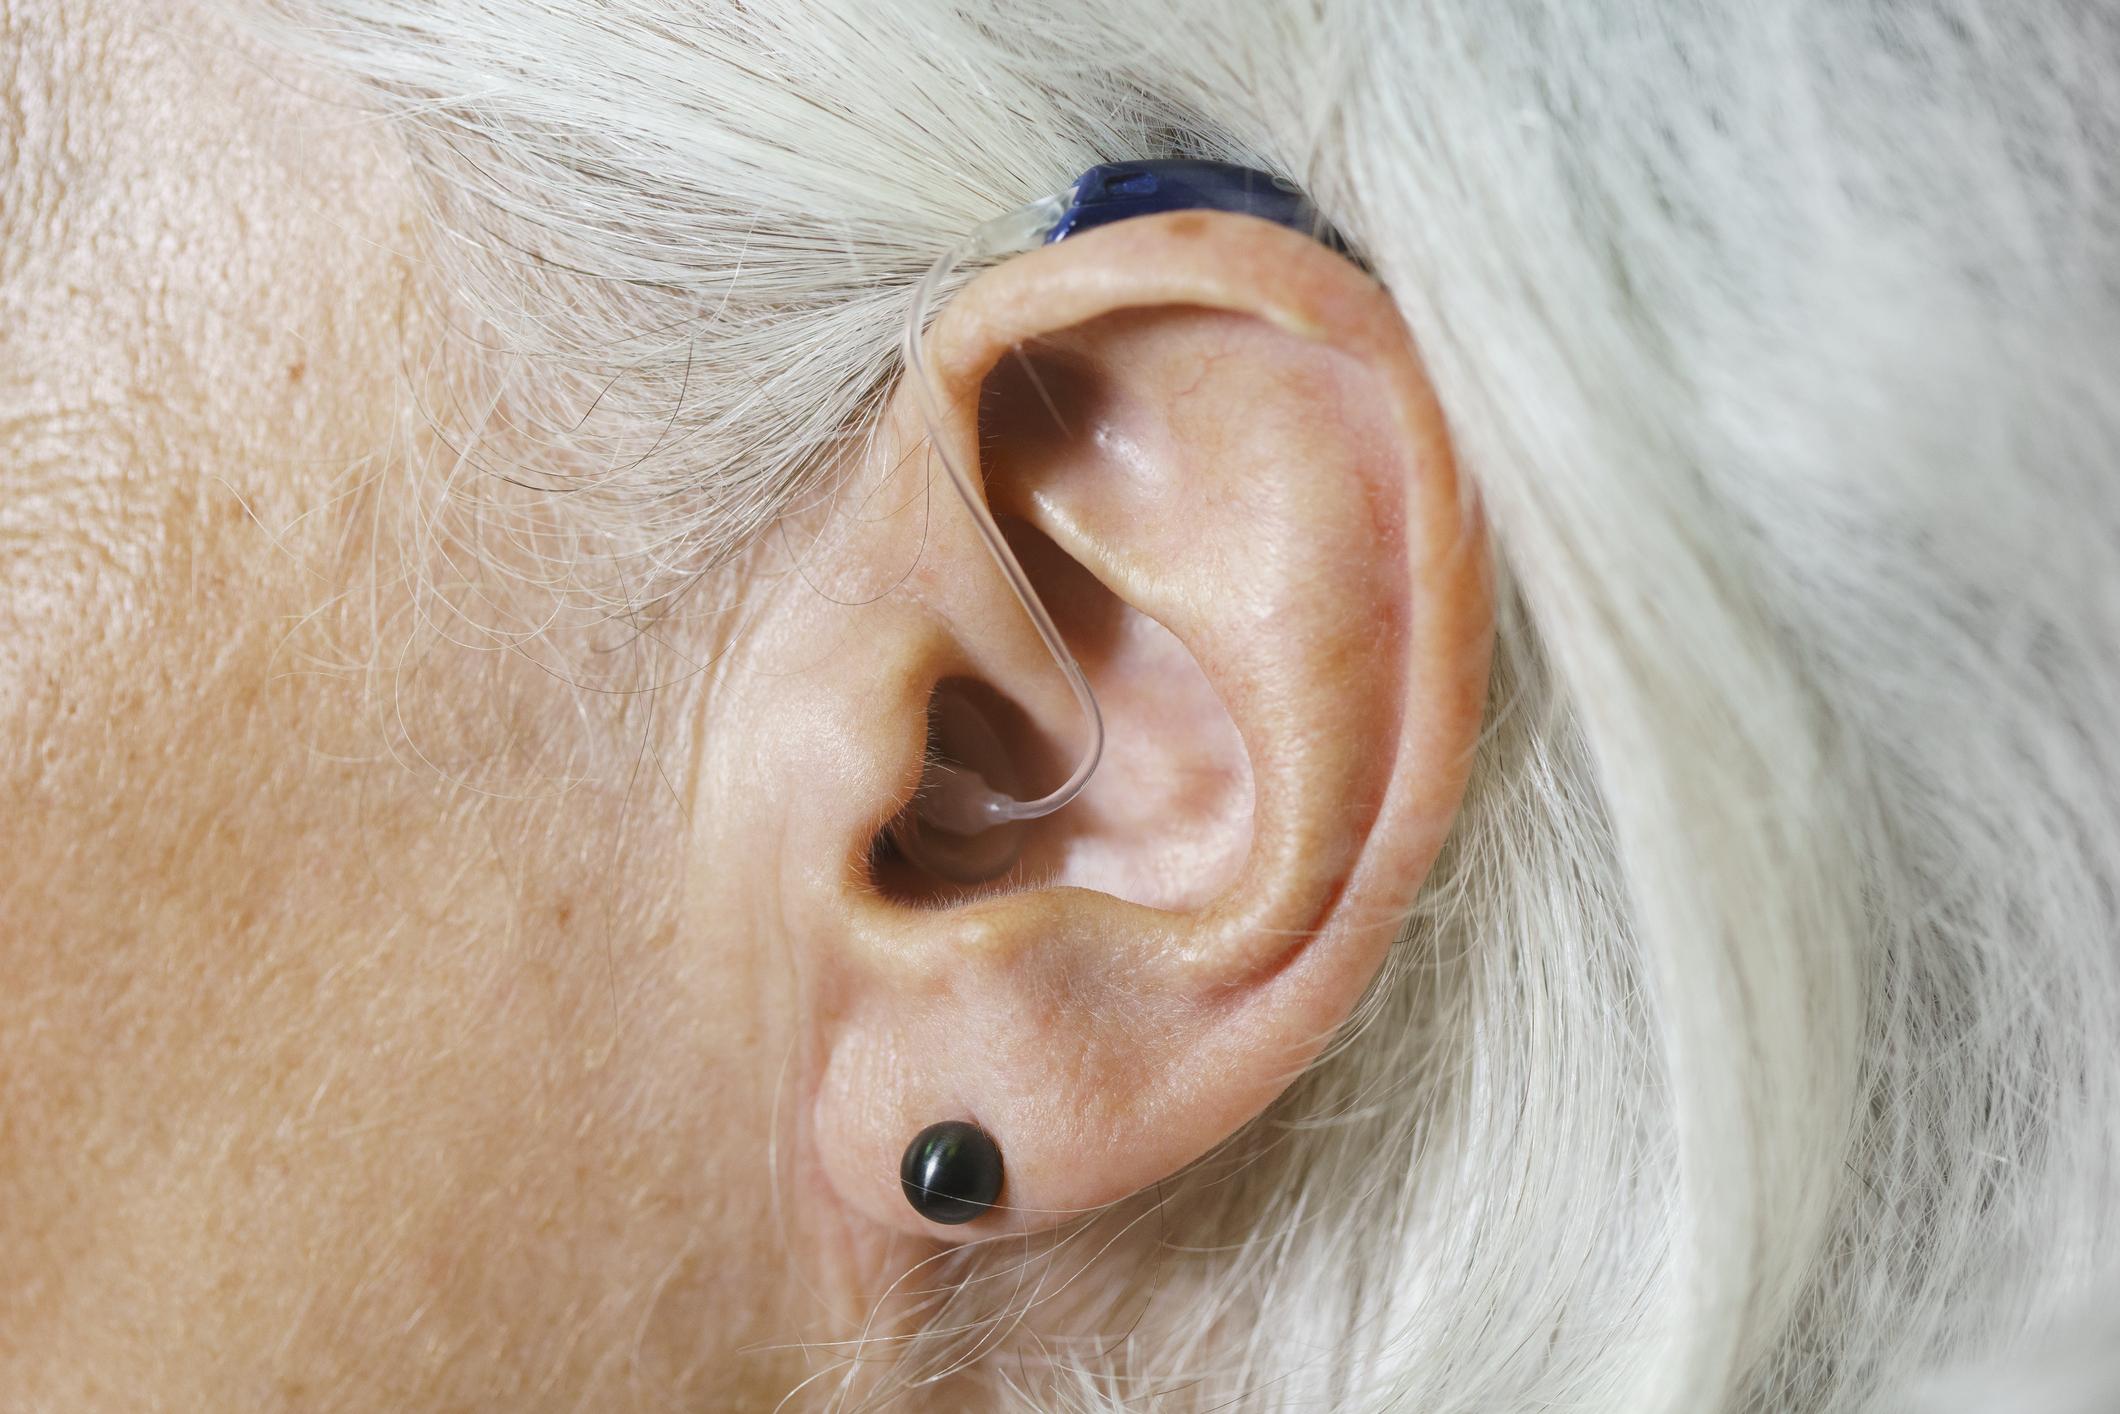 Appareil auditif rechargeable